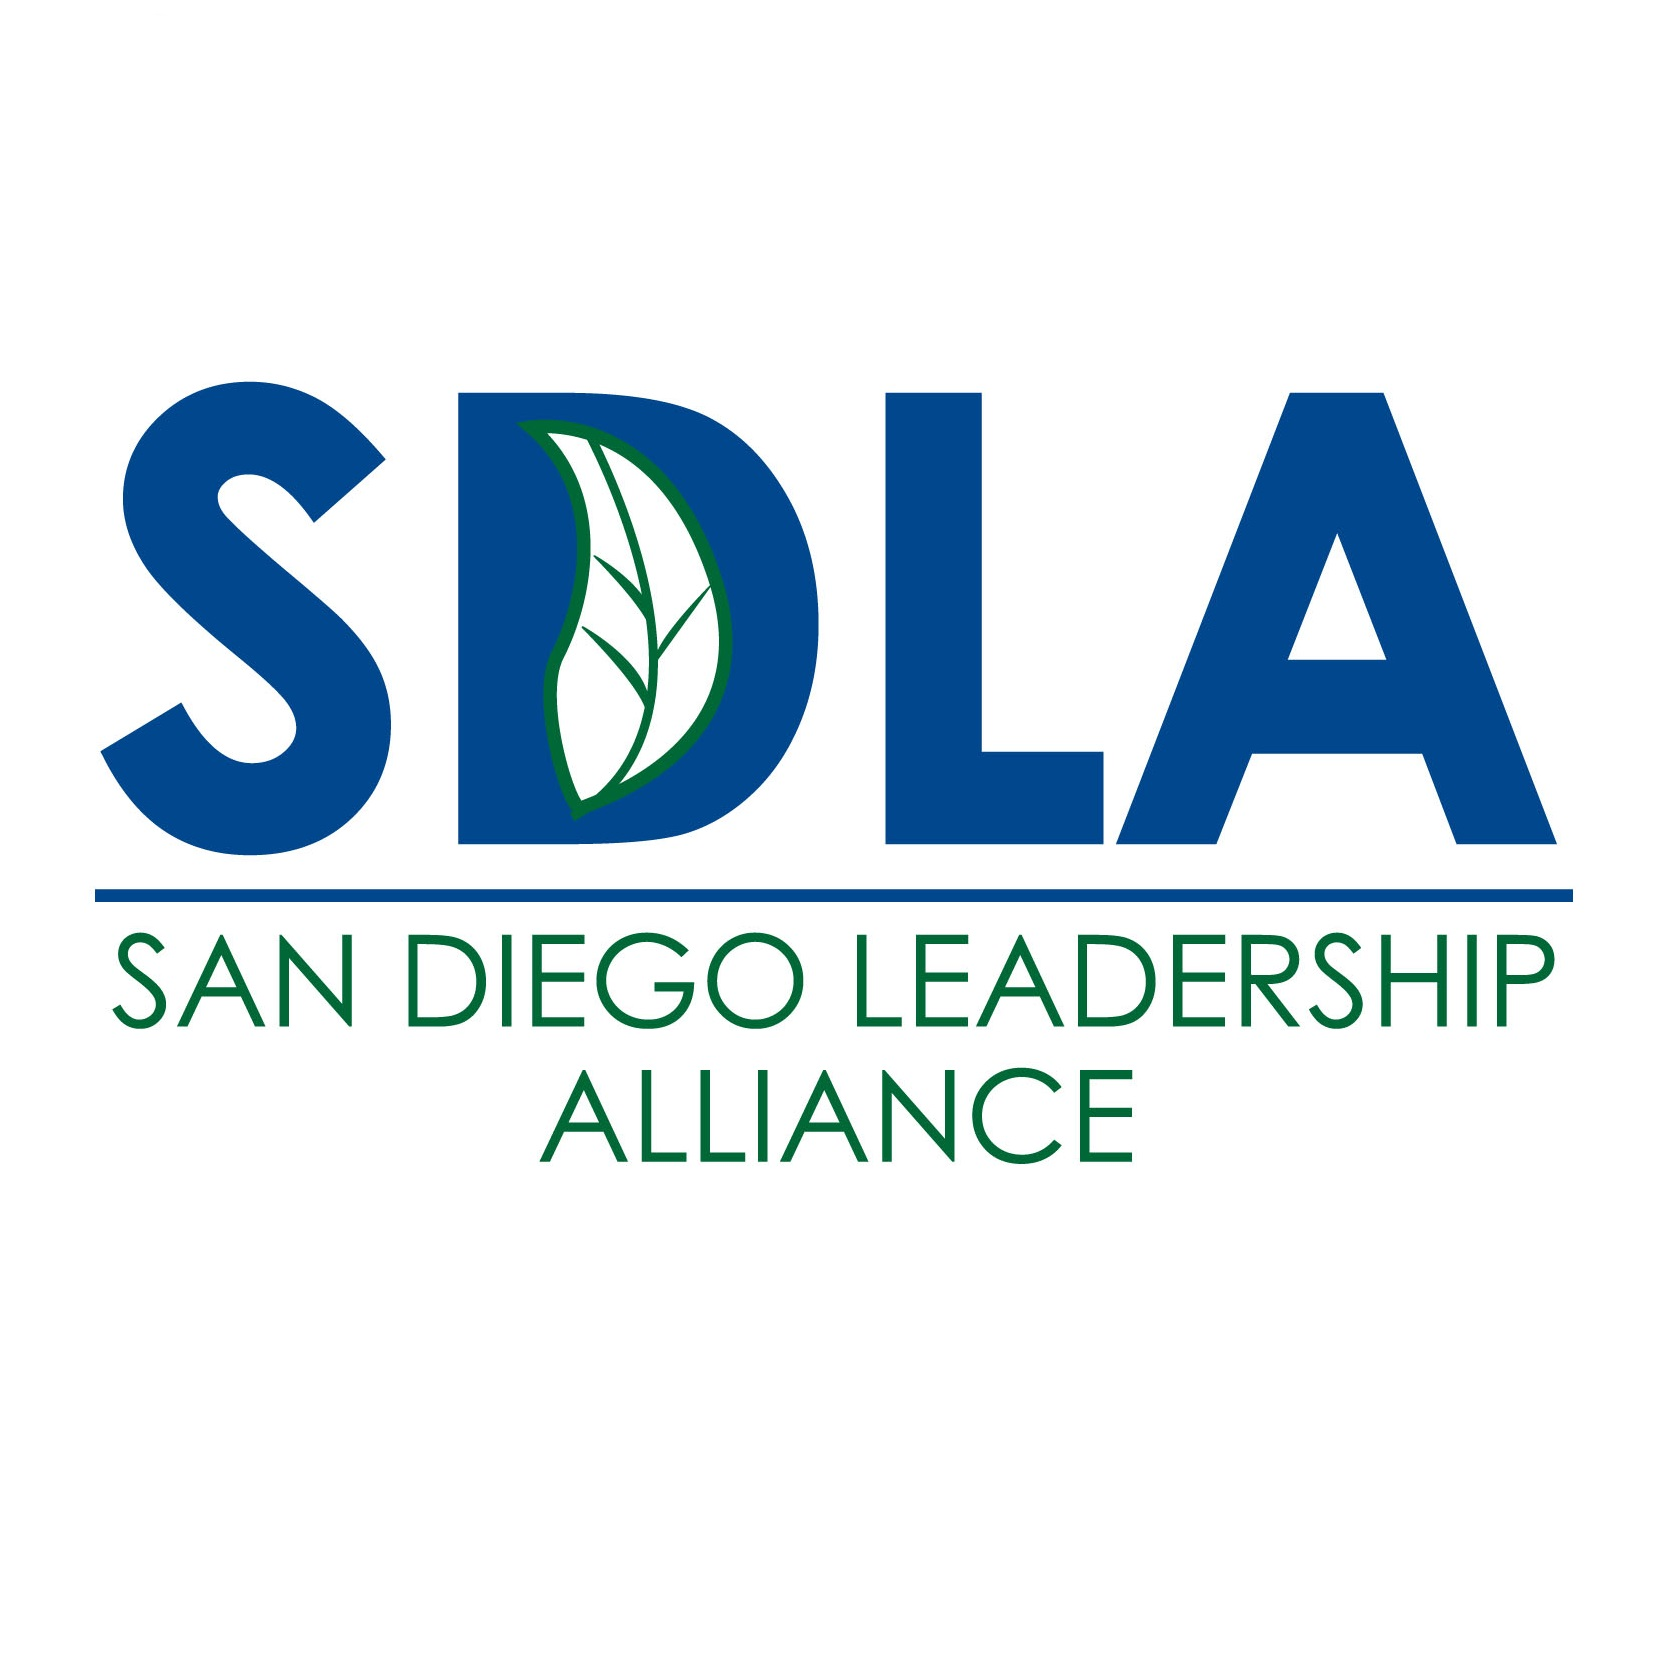 San Diego Leadership Alliance.jpg